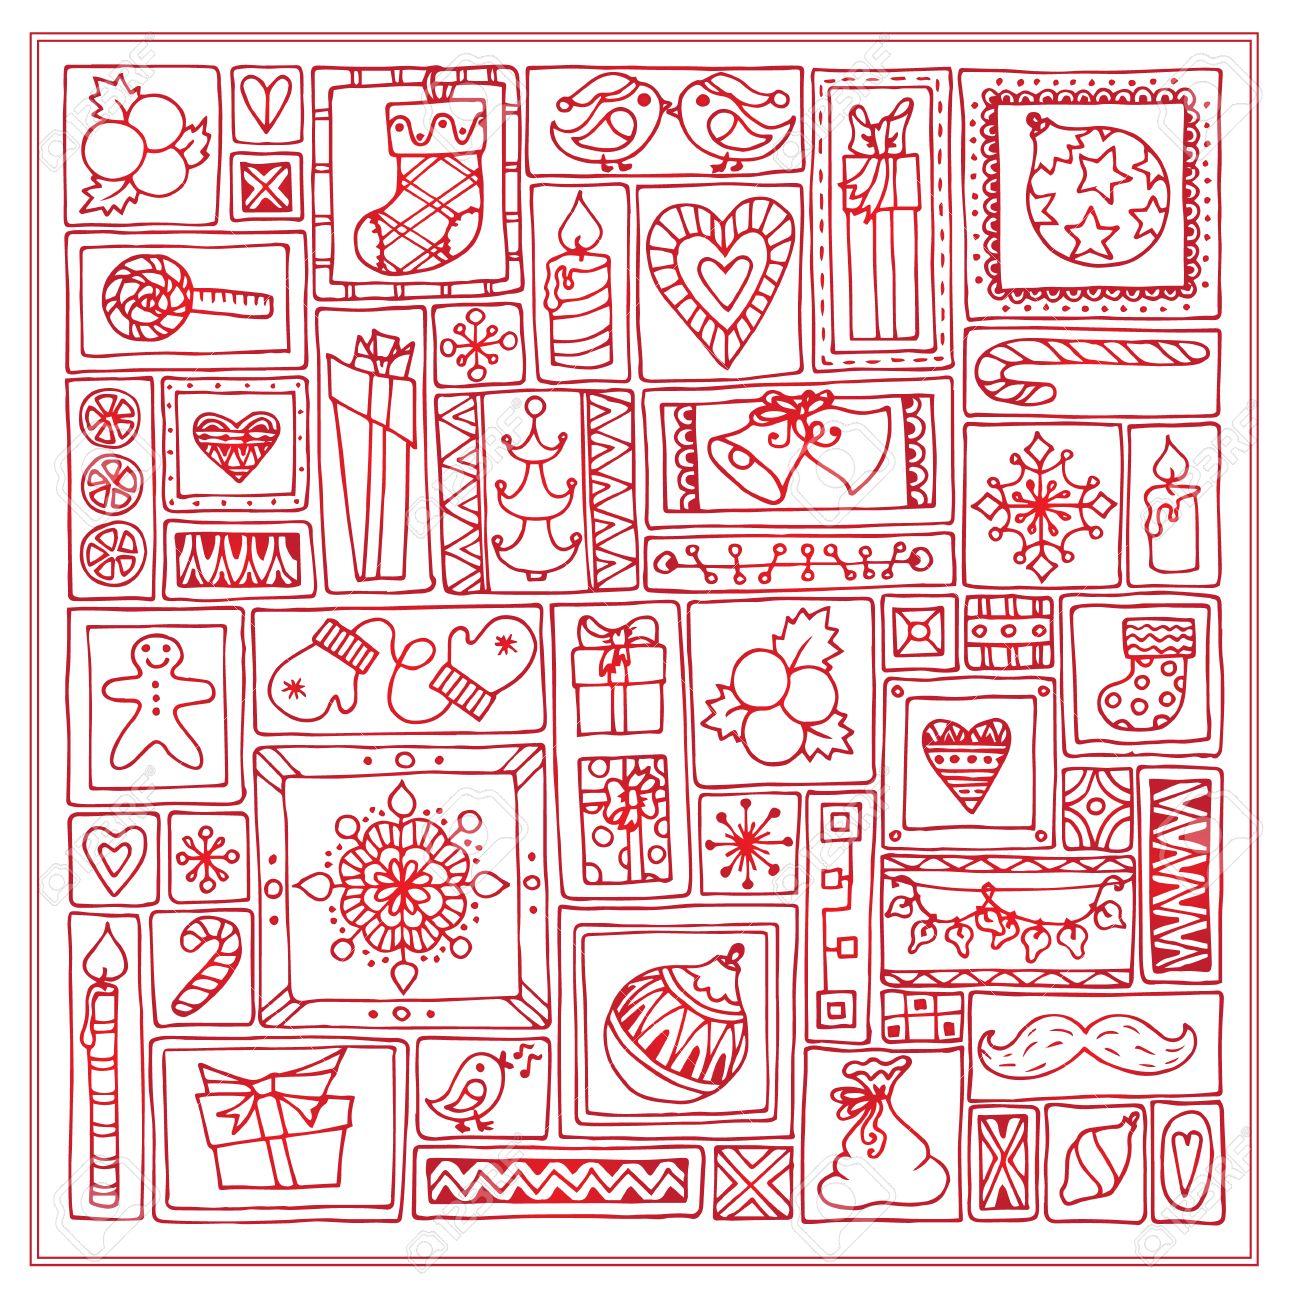 geometric christmas doodle hand drawn pattern template design